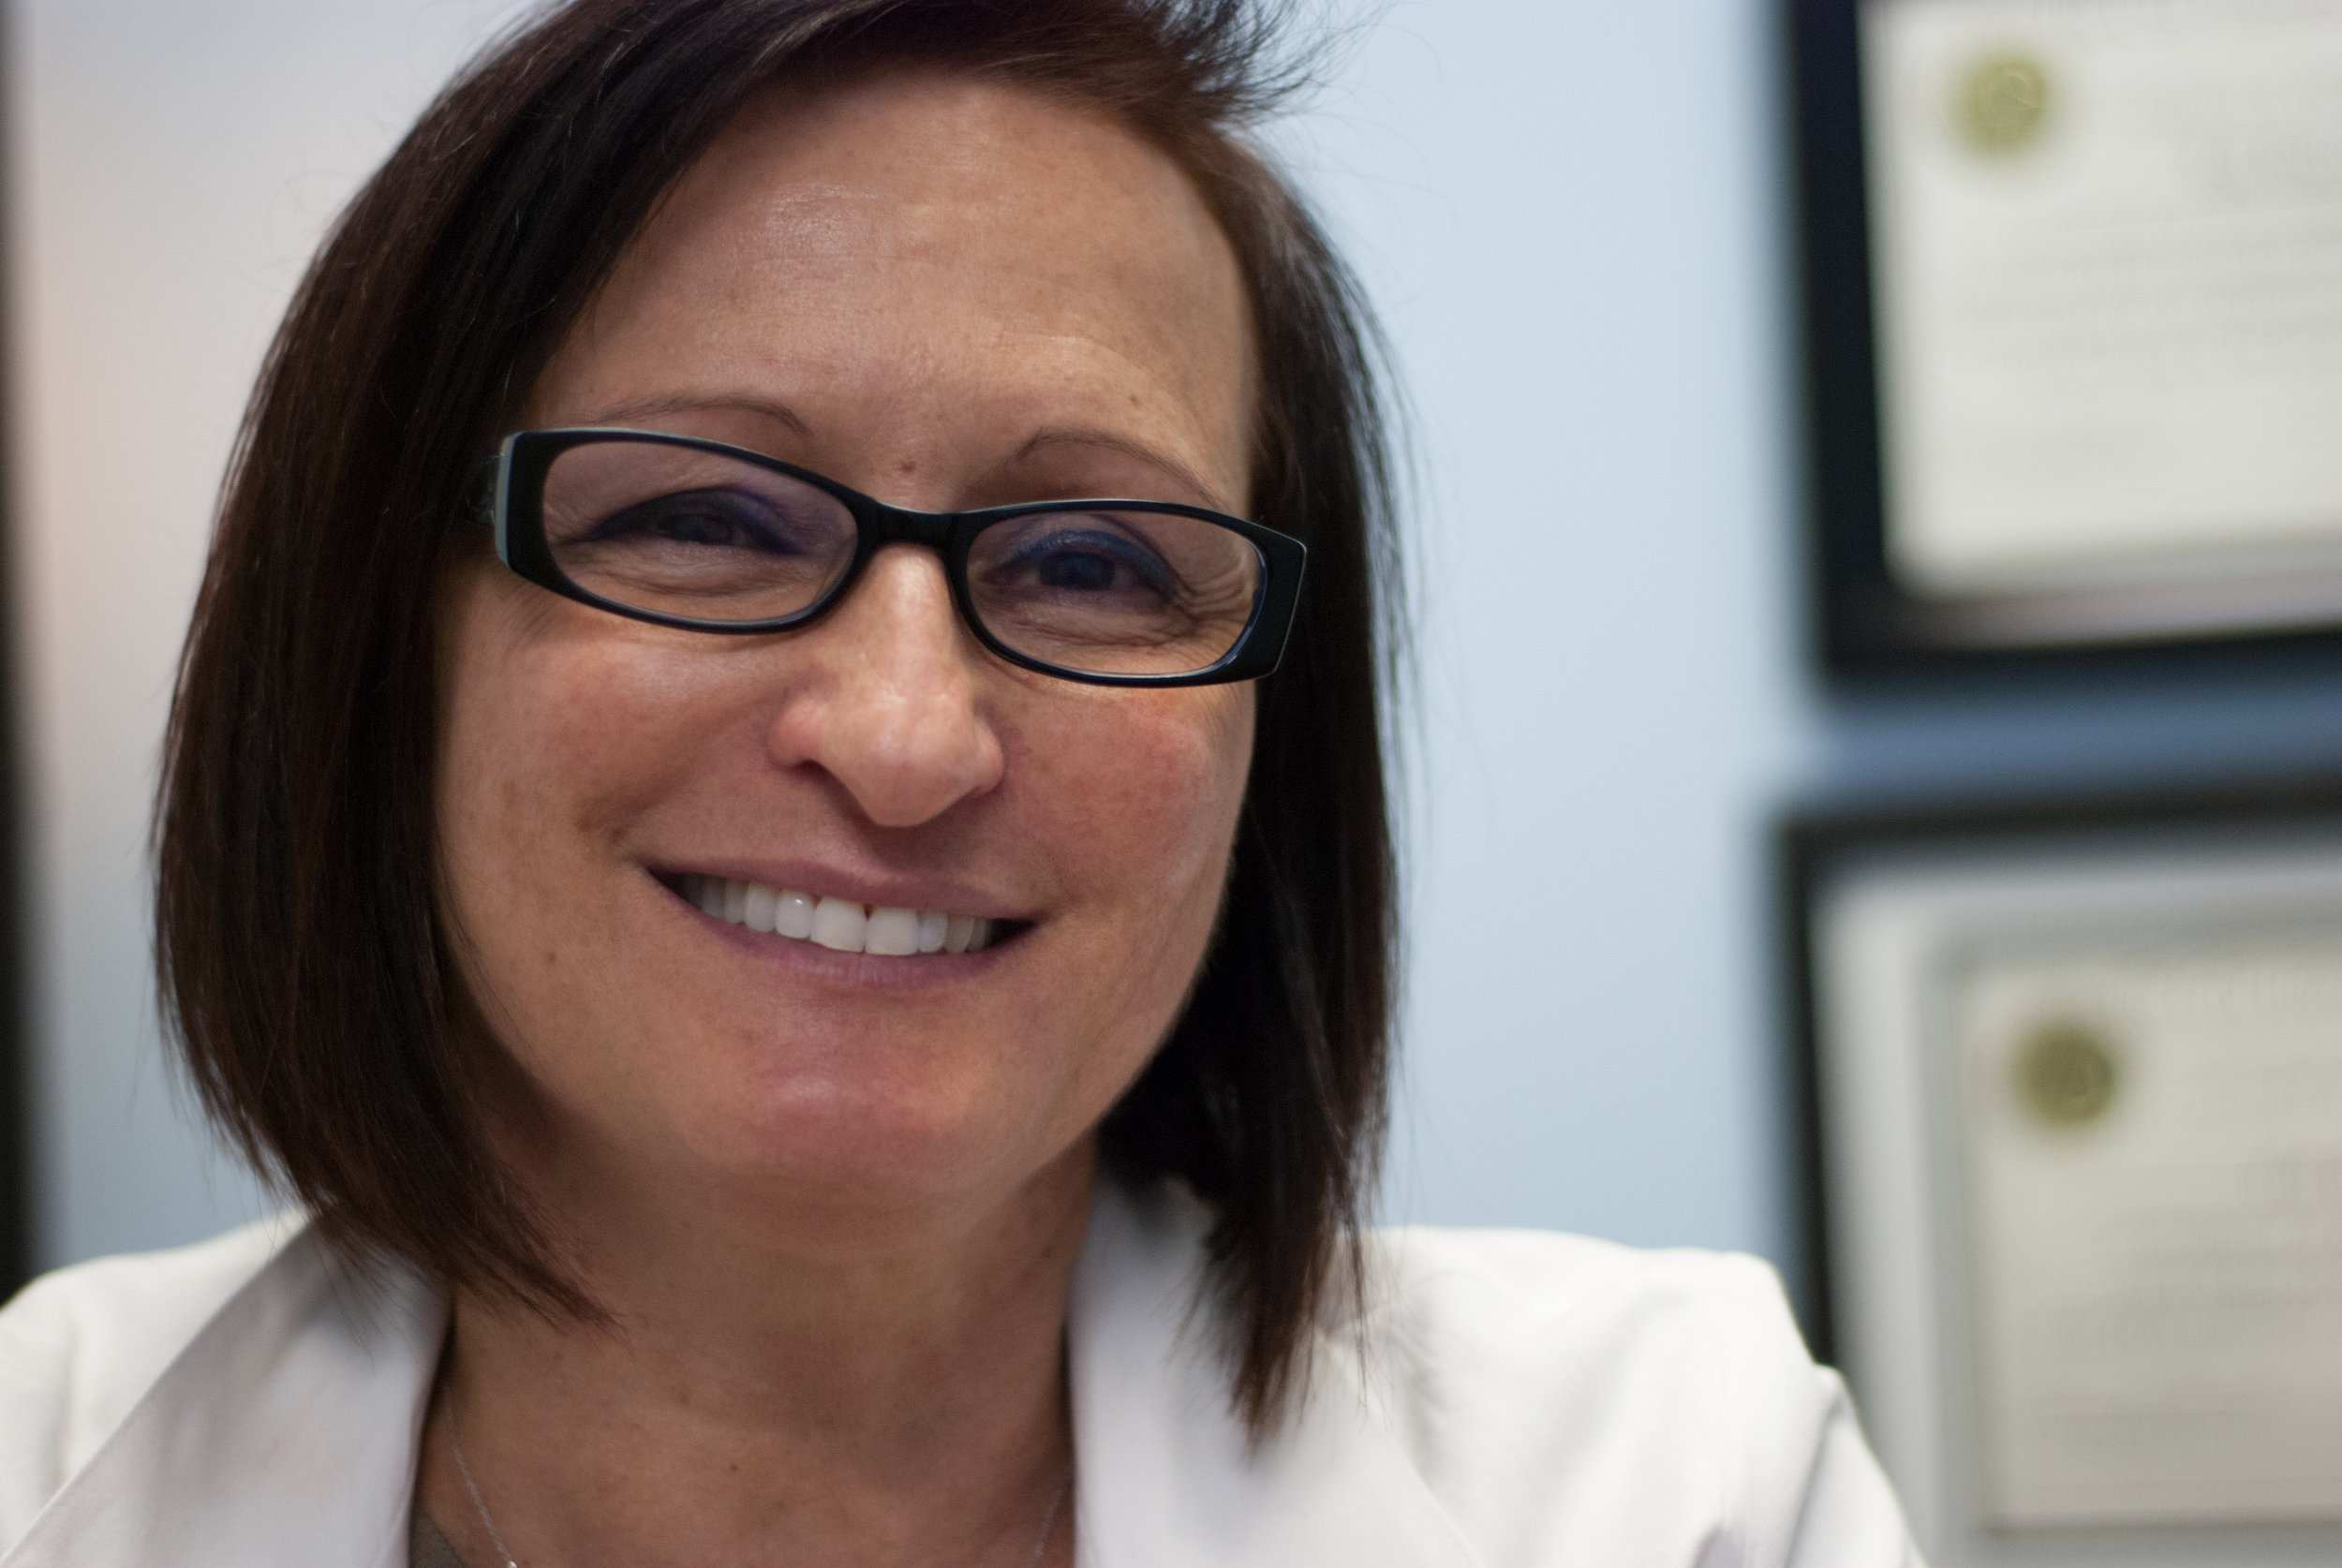 Chiropractor in Smyrna GA - Dr. Tali Pariser - Lower Back Pain Relief